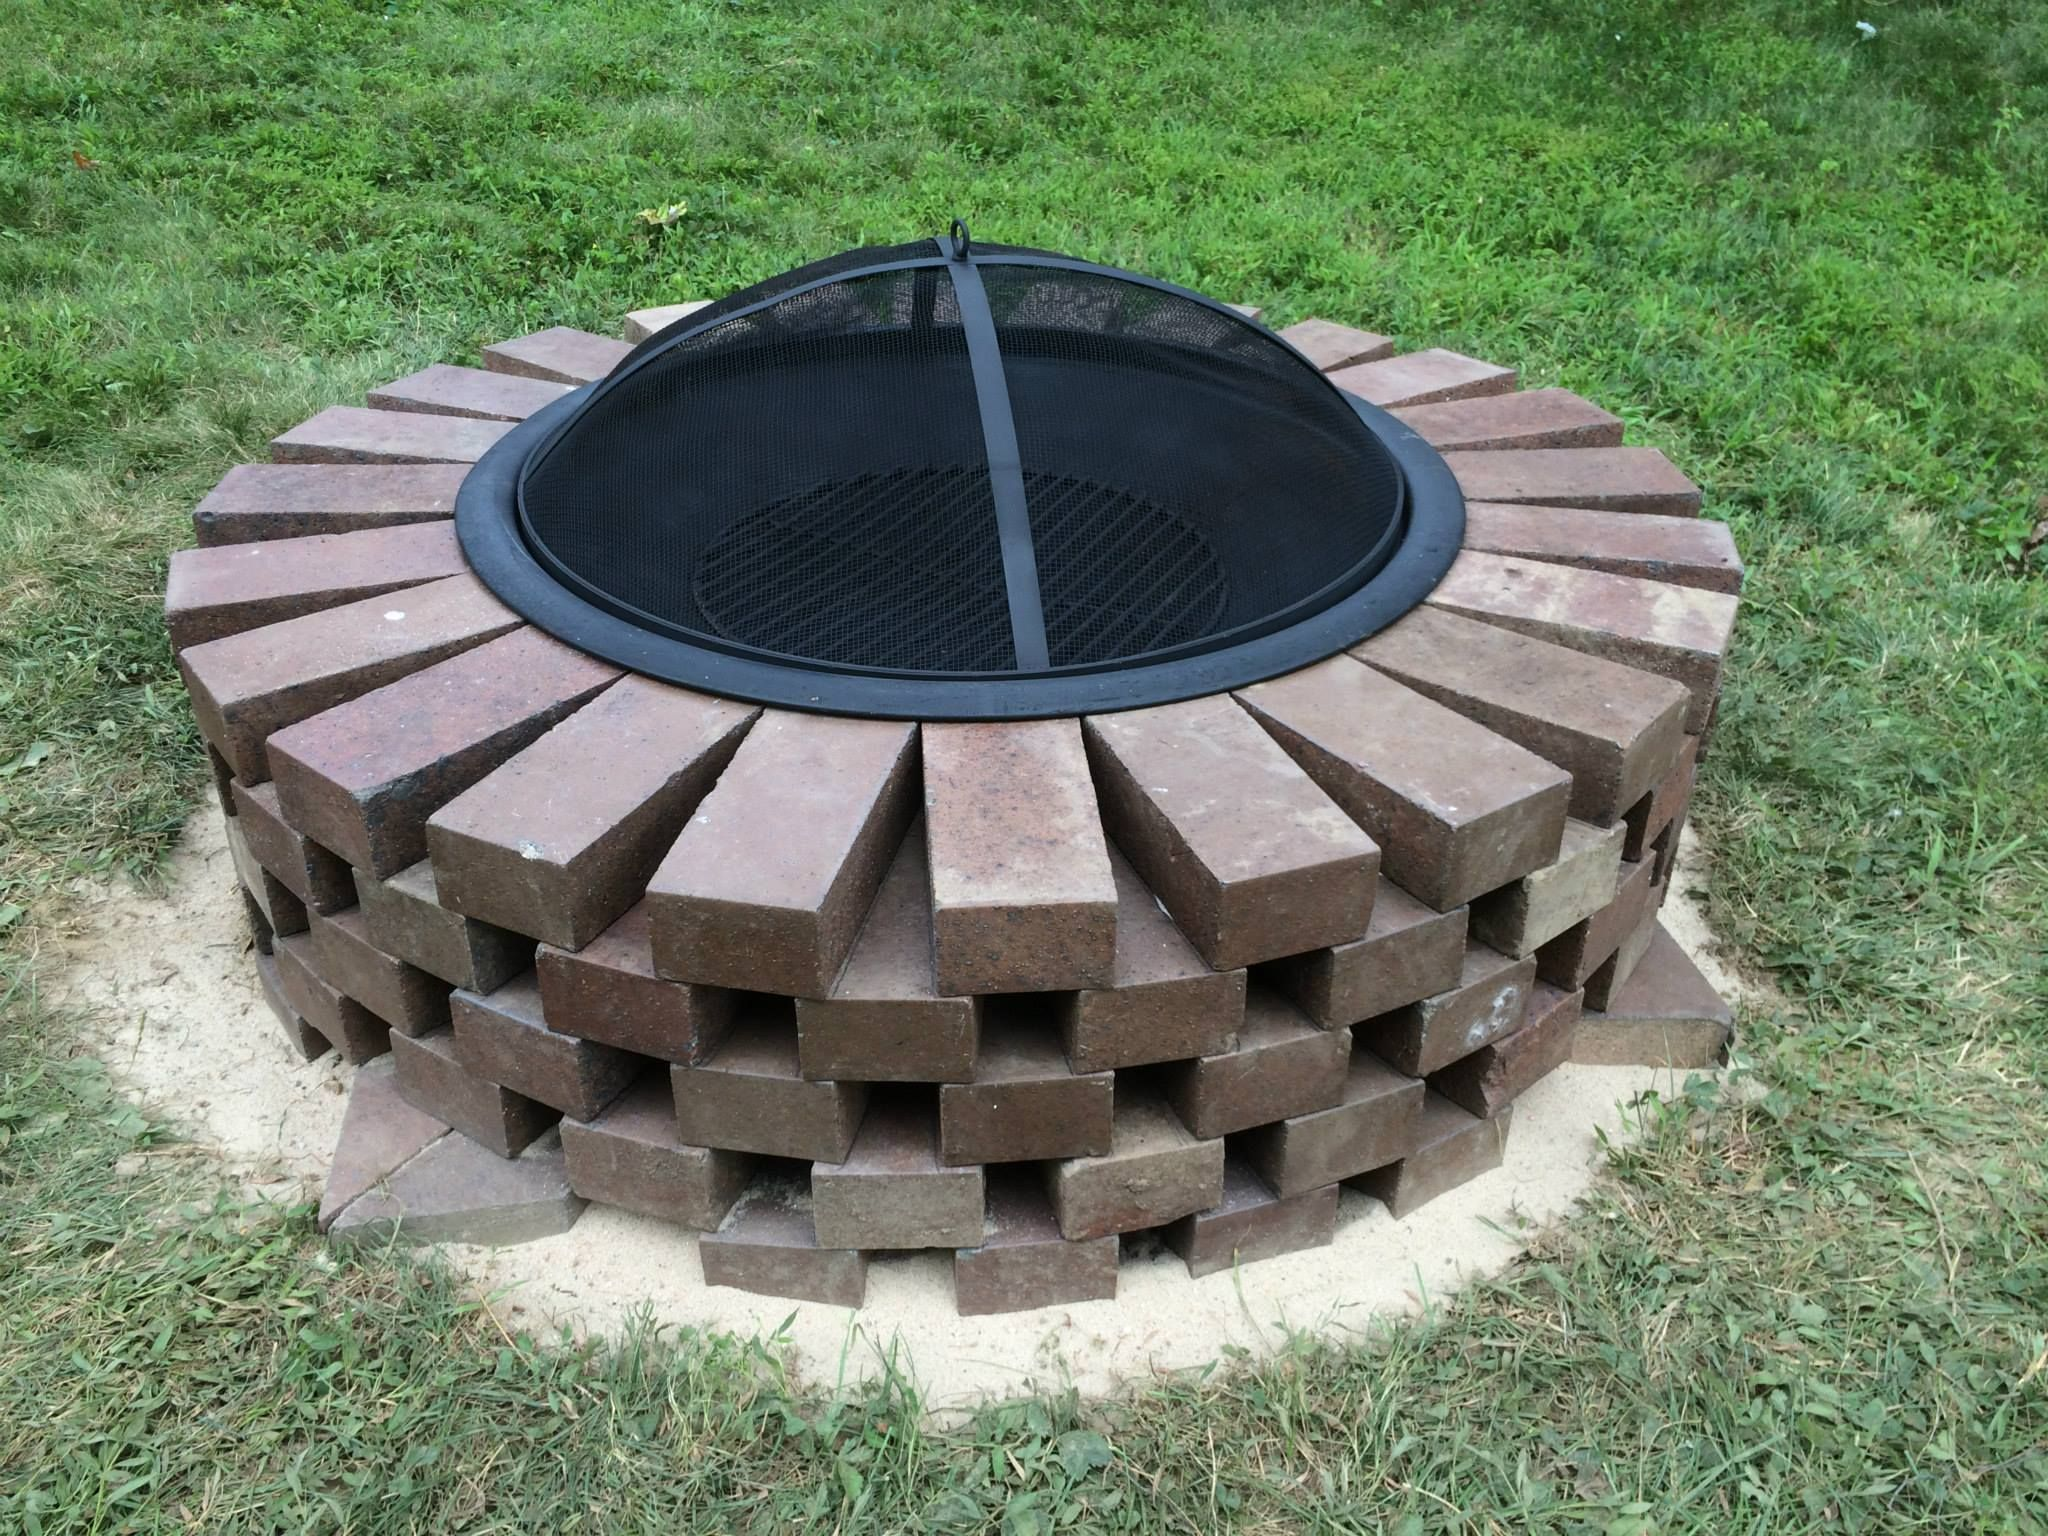 Fire Pit made with scavenged bricks, sand and masonry ...